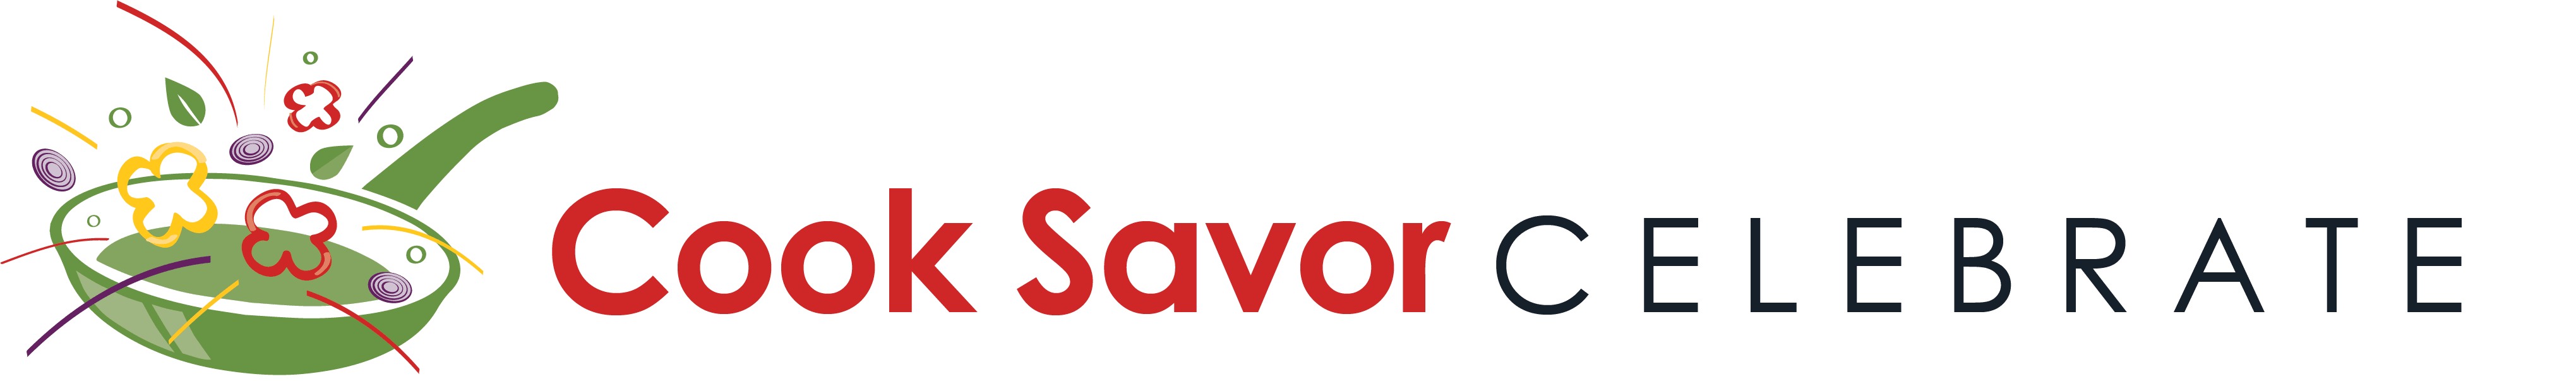 Cook Savor Celebrate